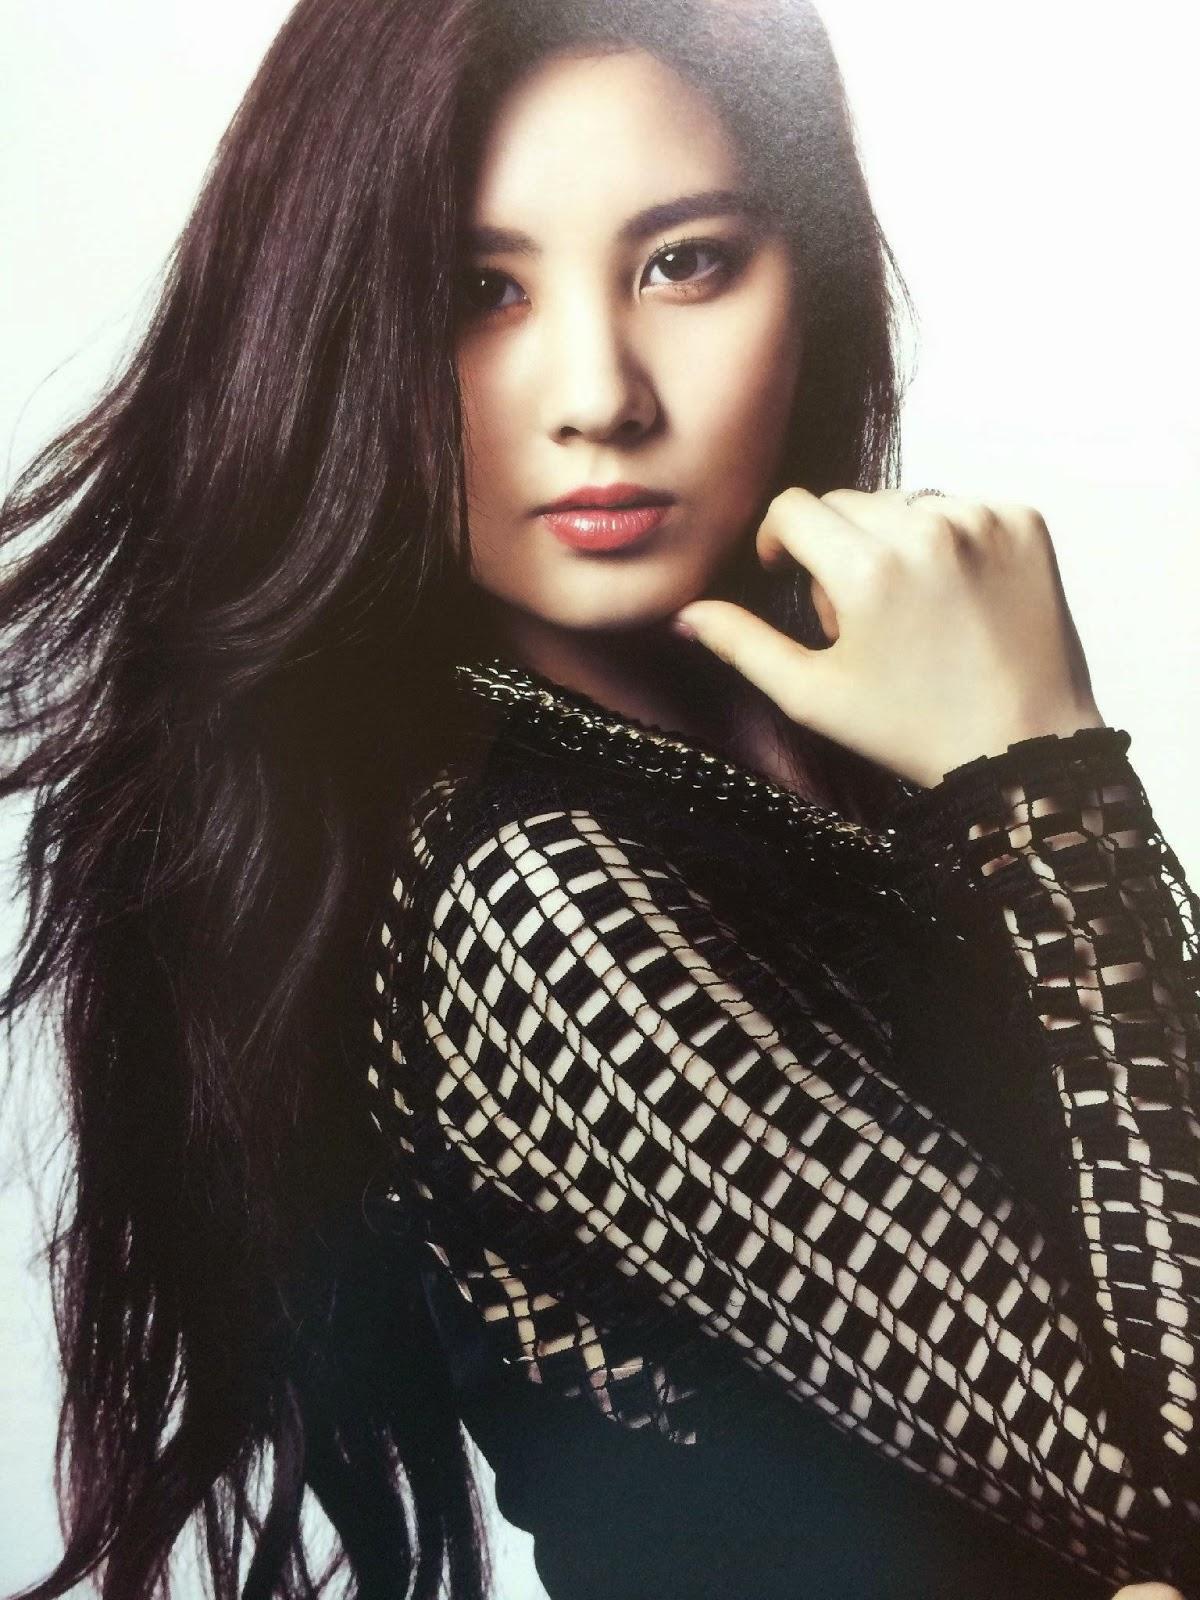 SNSD Seohyun (서현; ソヒョン) Girls Generation The Best Scan Photos